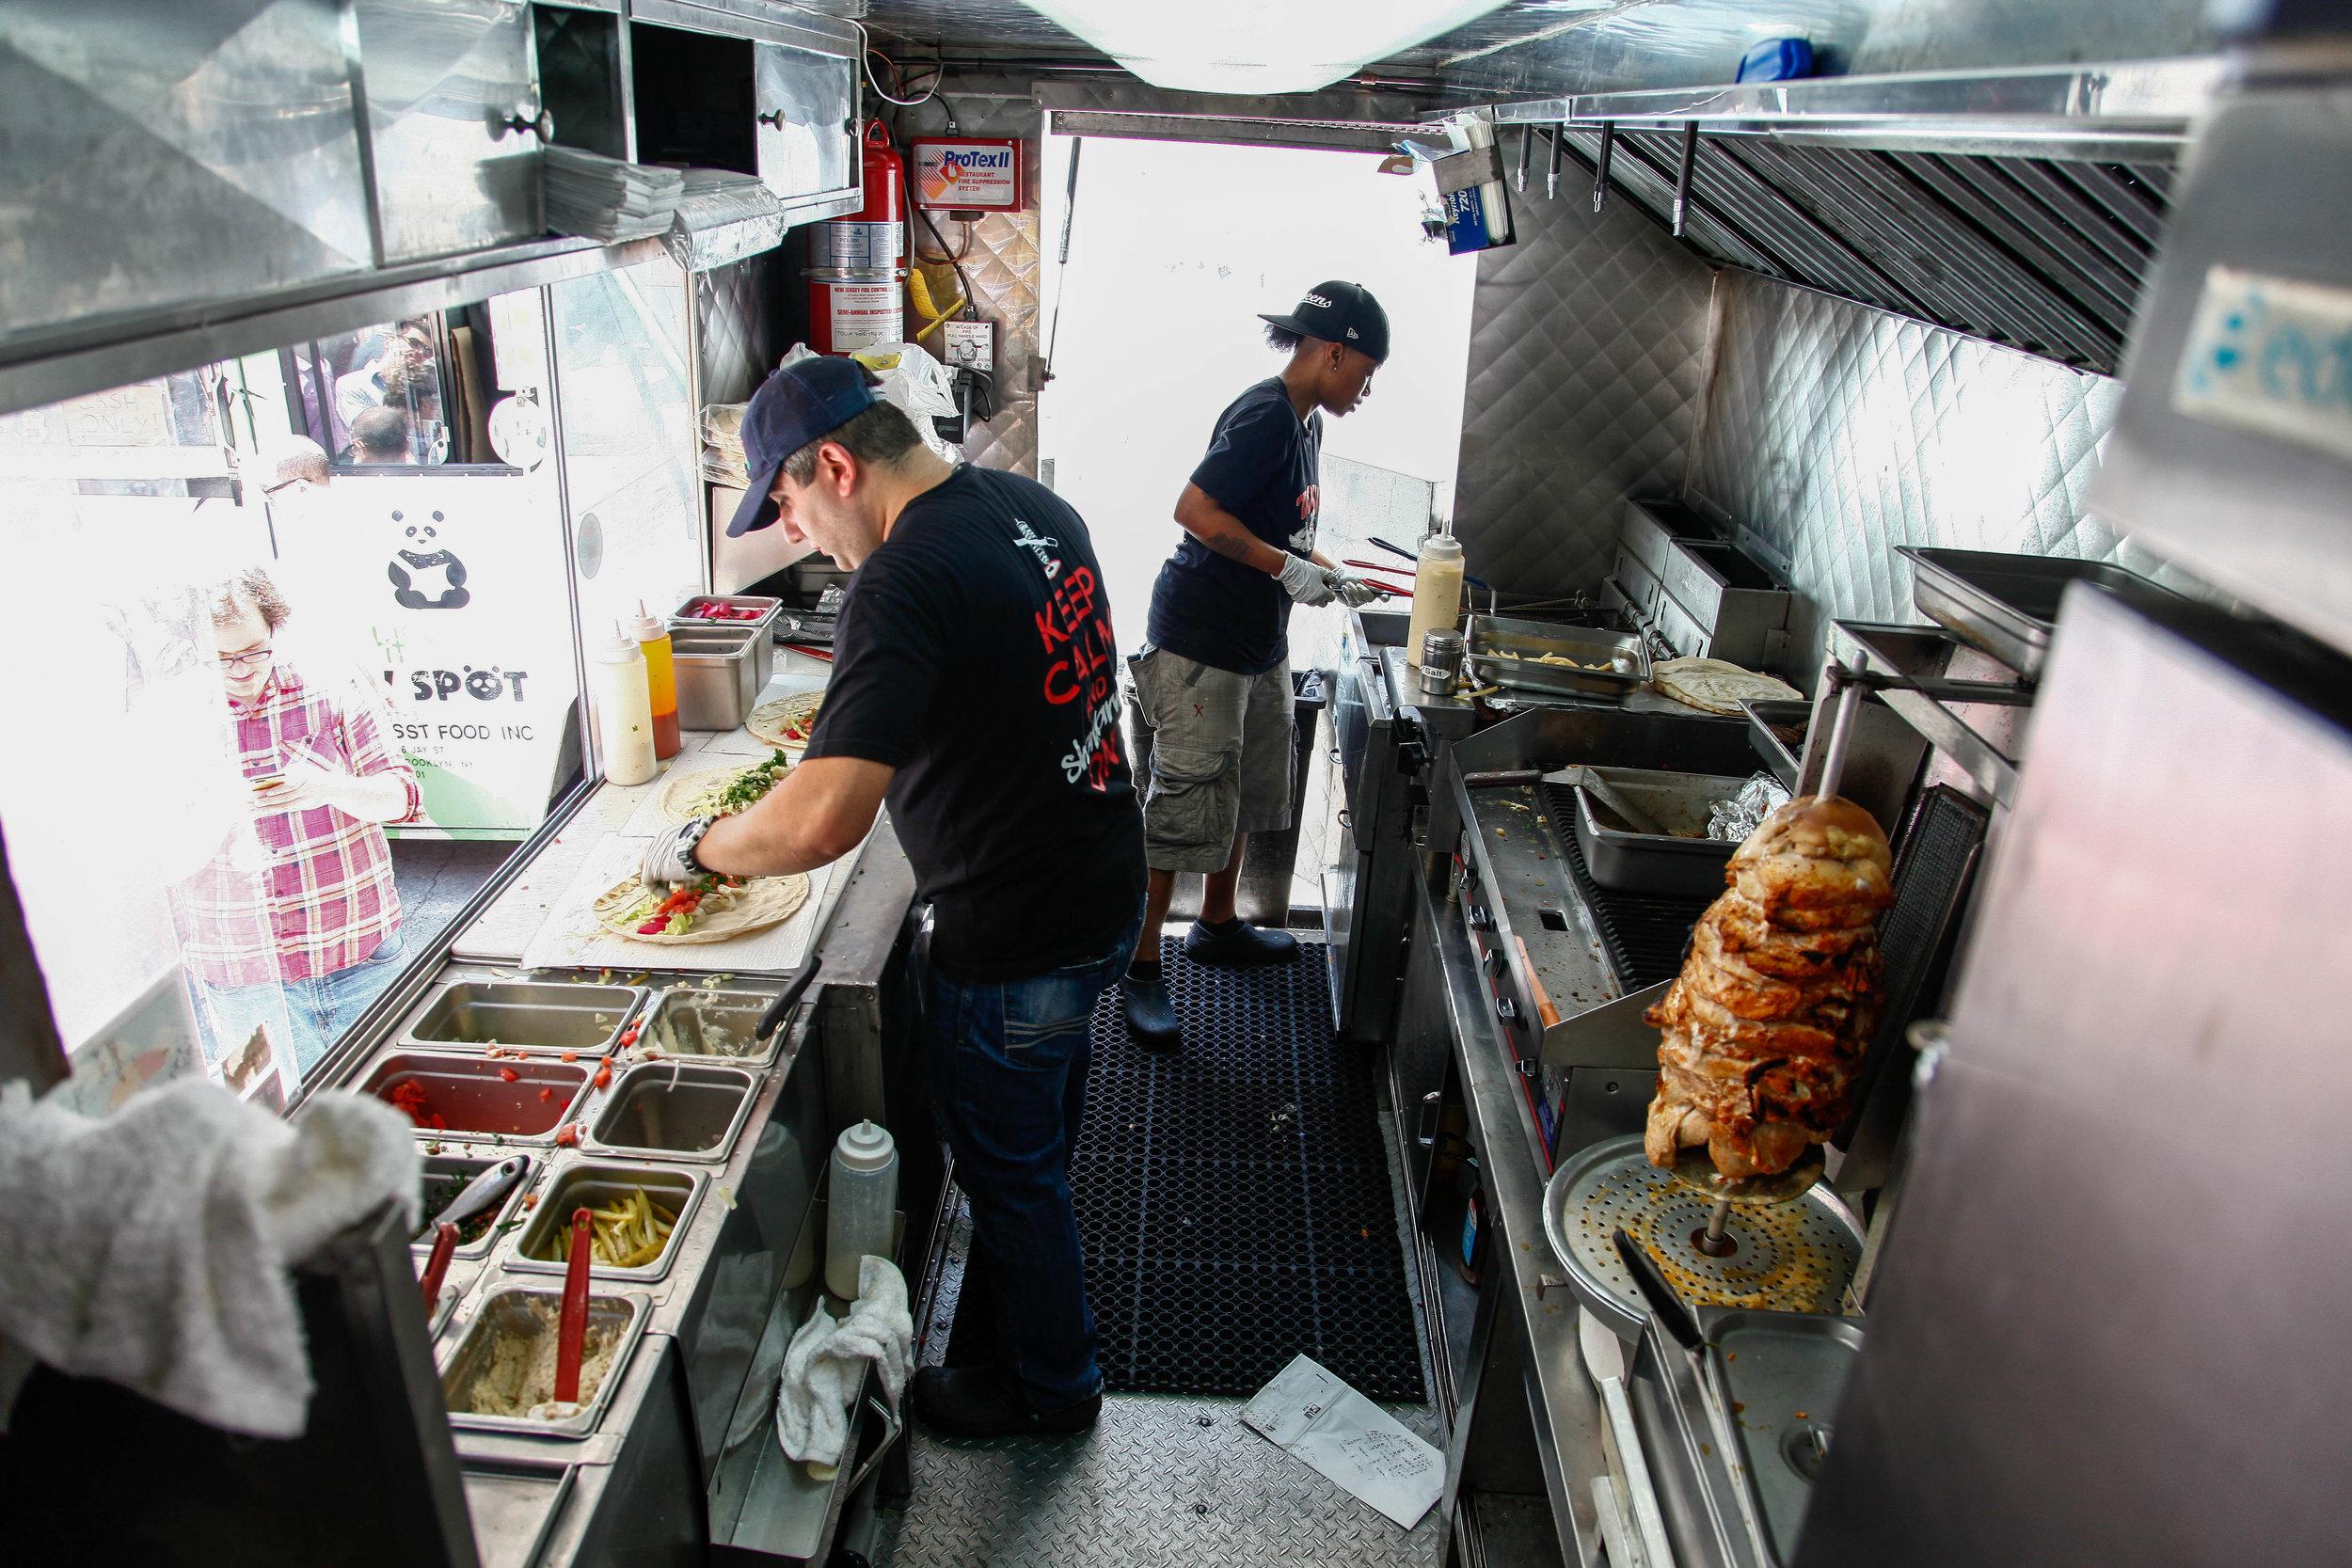 toum behind the food truck window.JPG